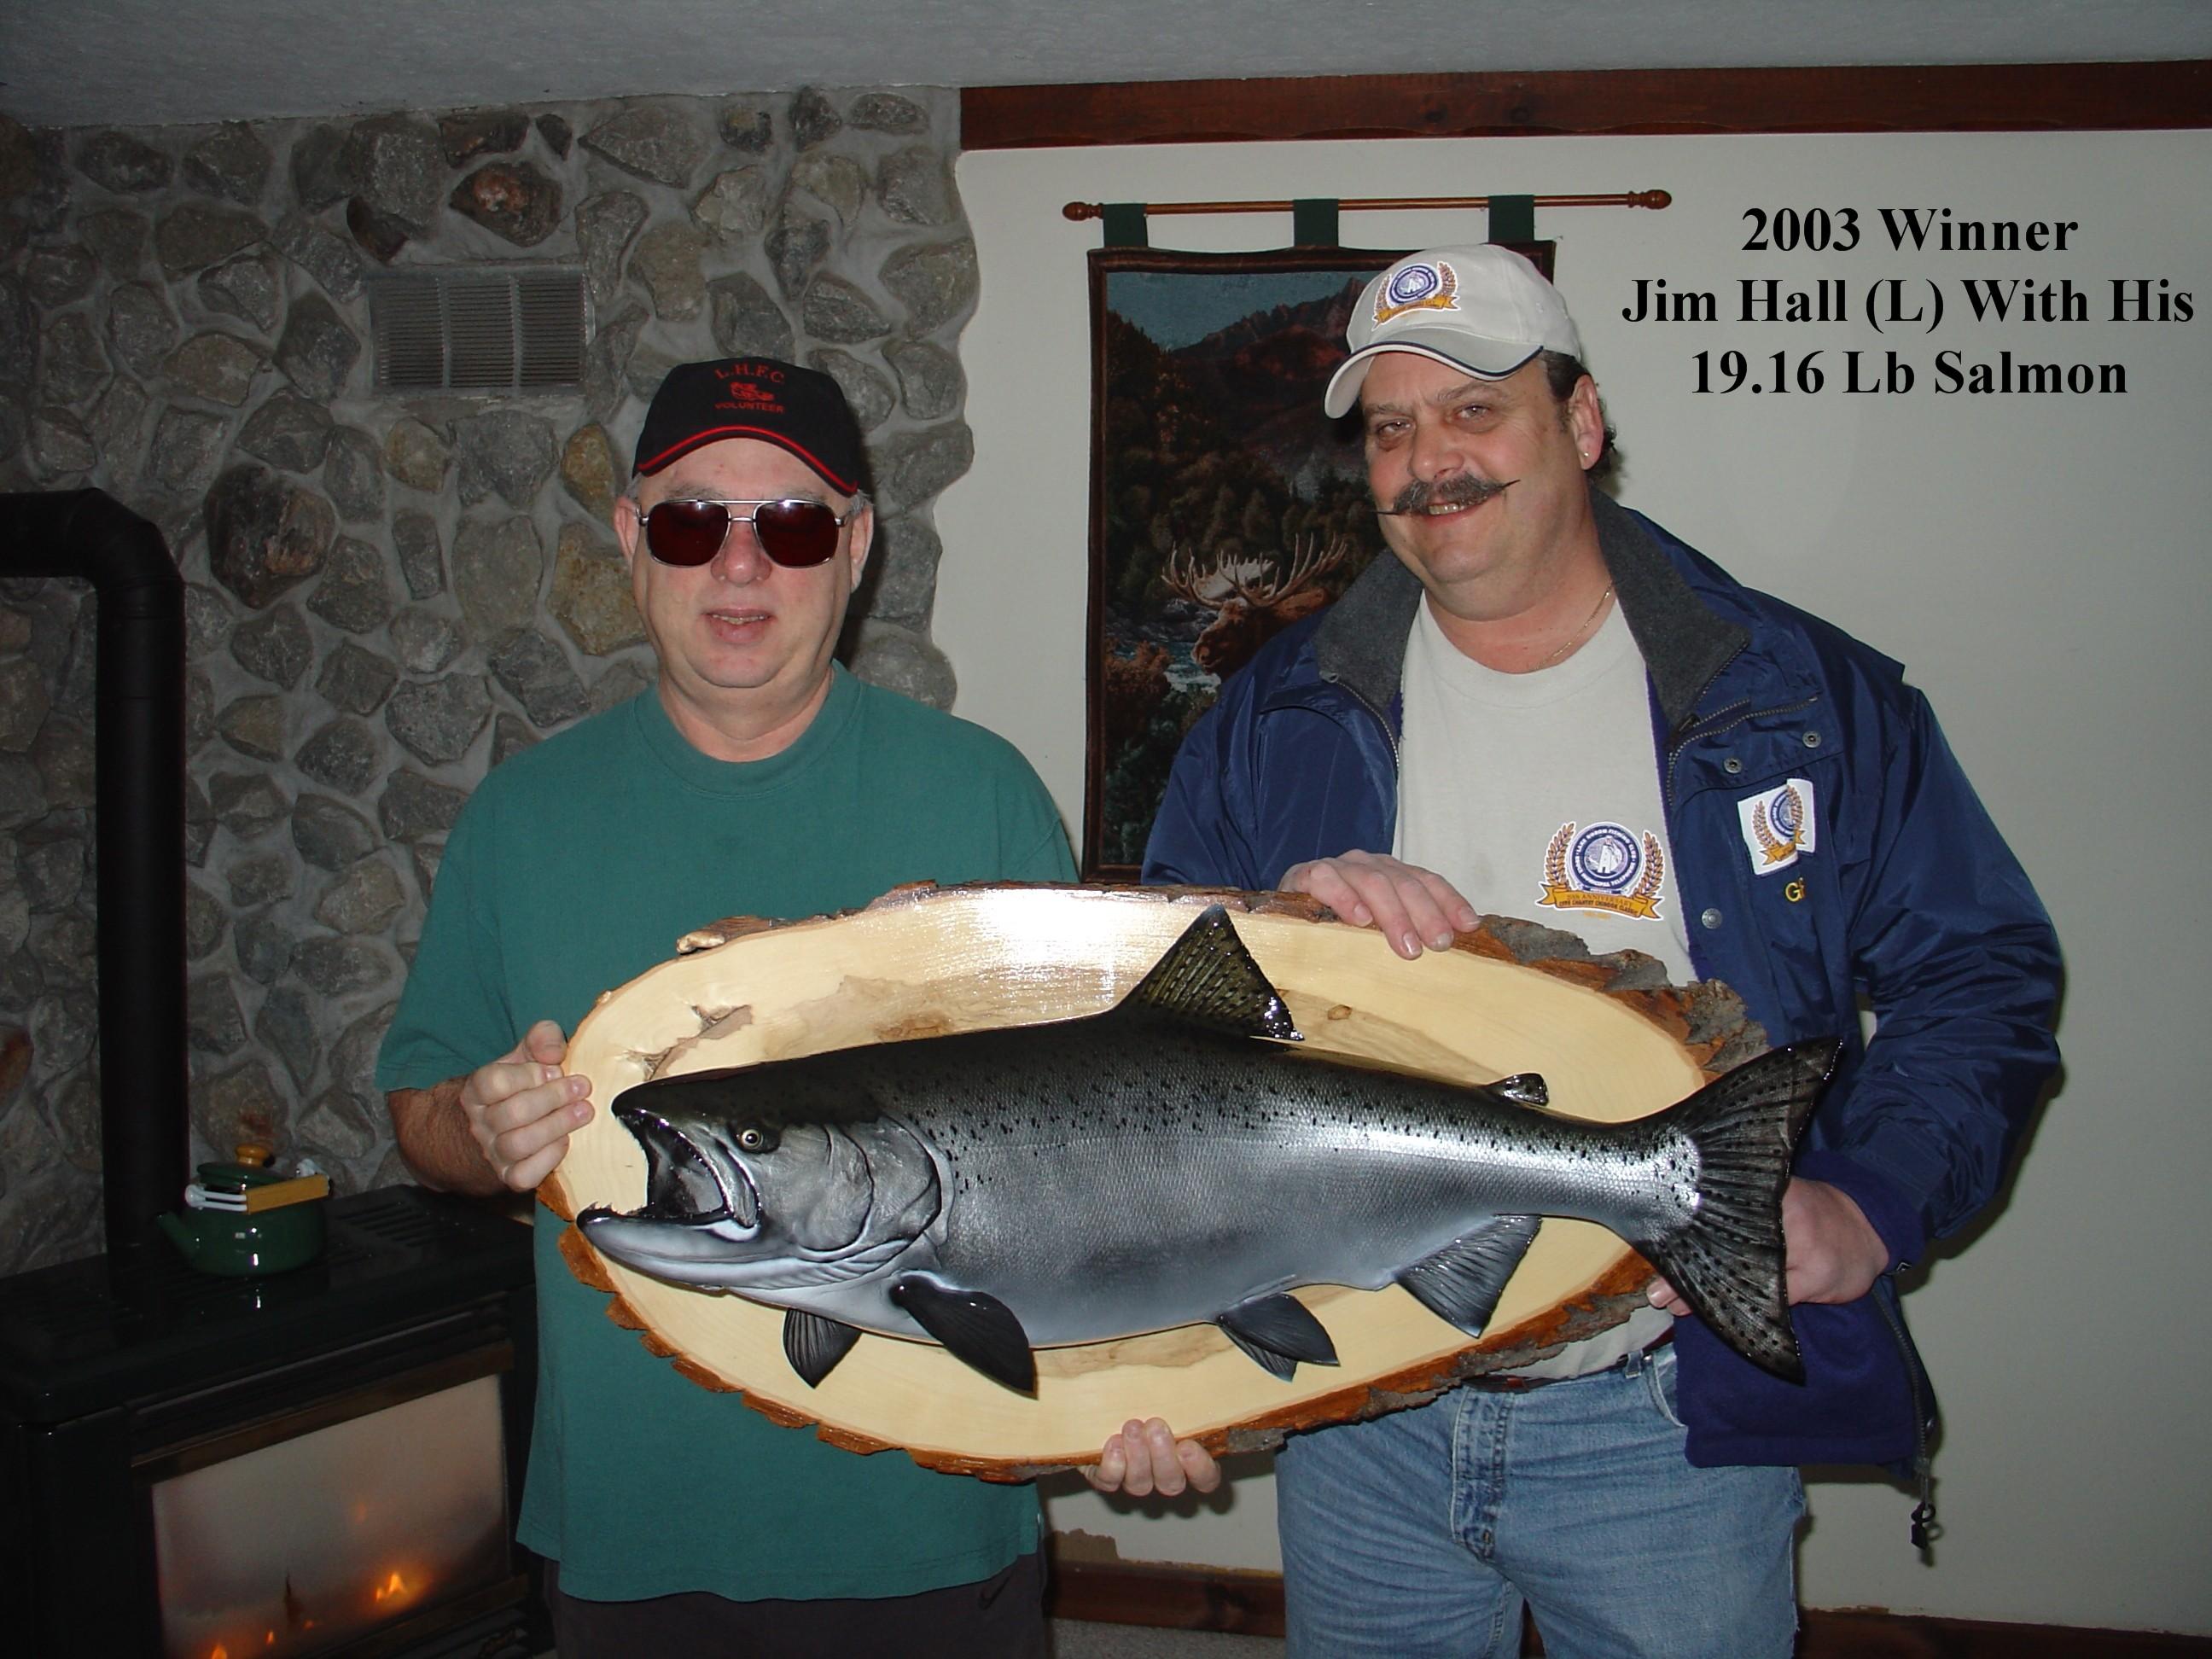 2003 Winner Jim Hall